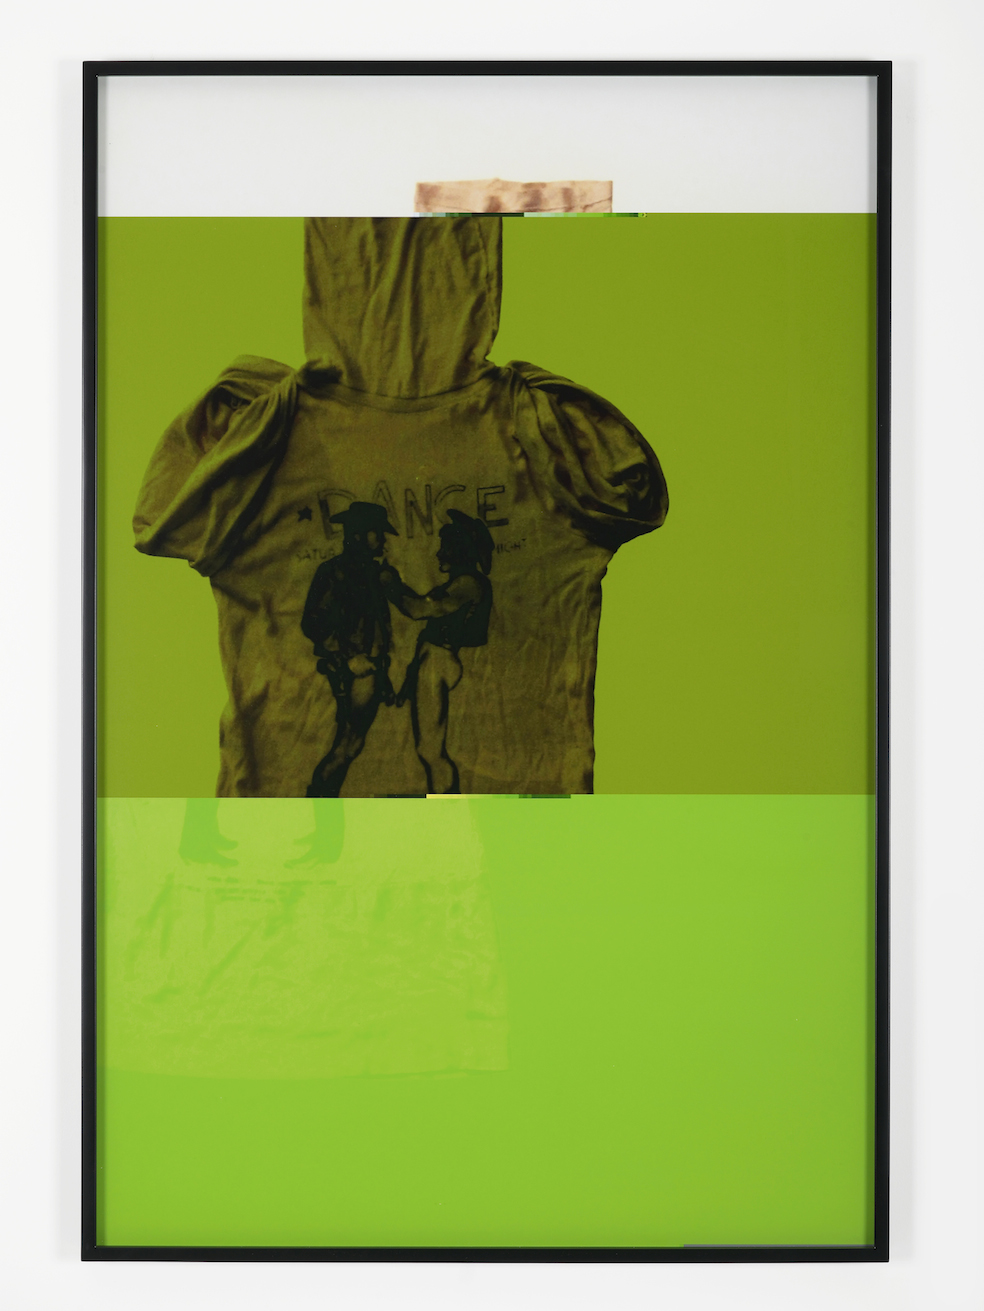 Alien Sauce 2014 Archival Pigment Print 106.6 x 71.1 cm / 42 x 28 in Unique